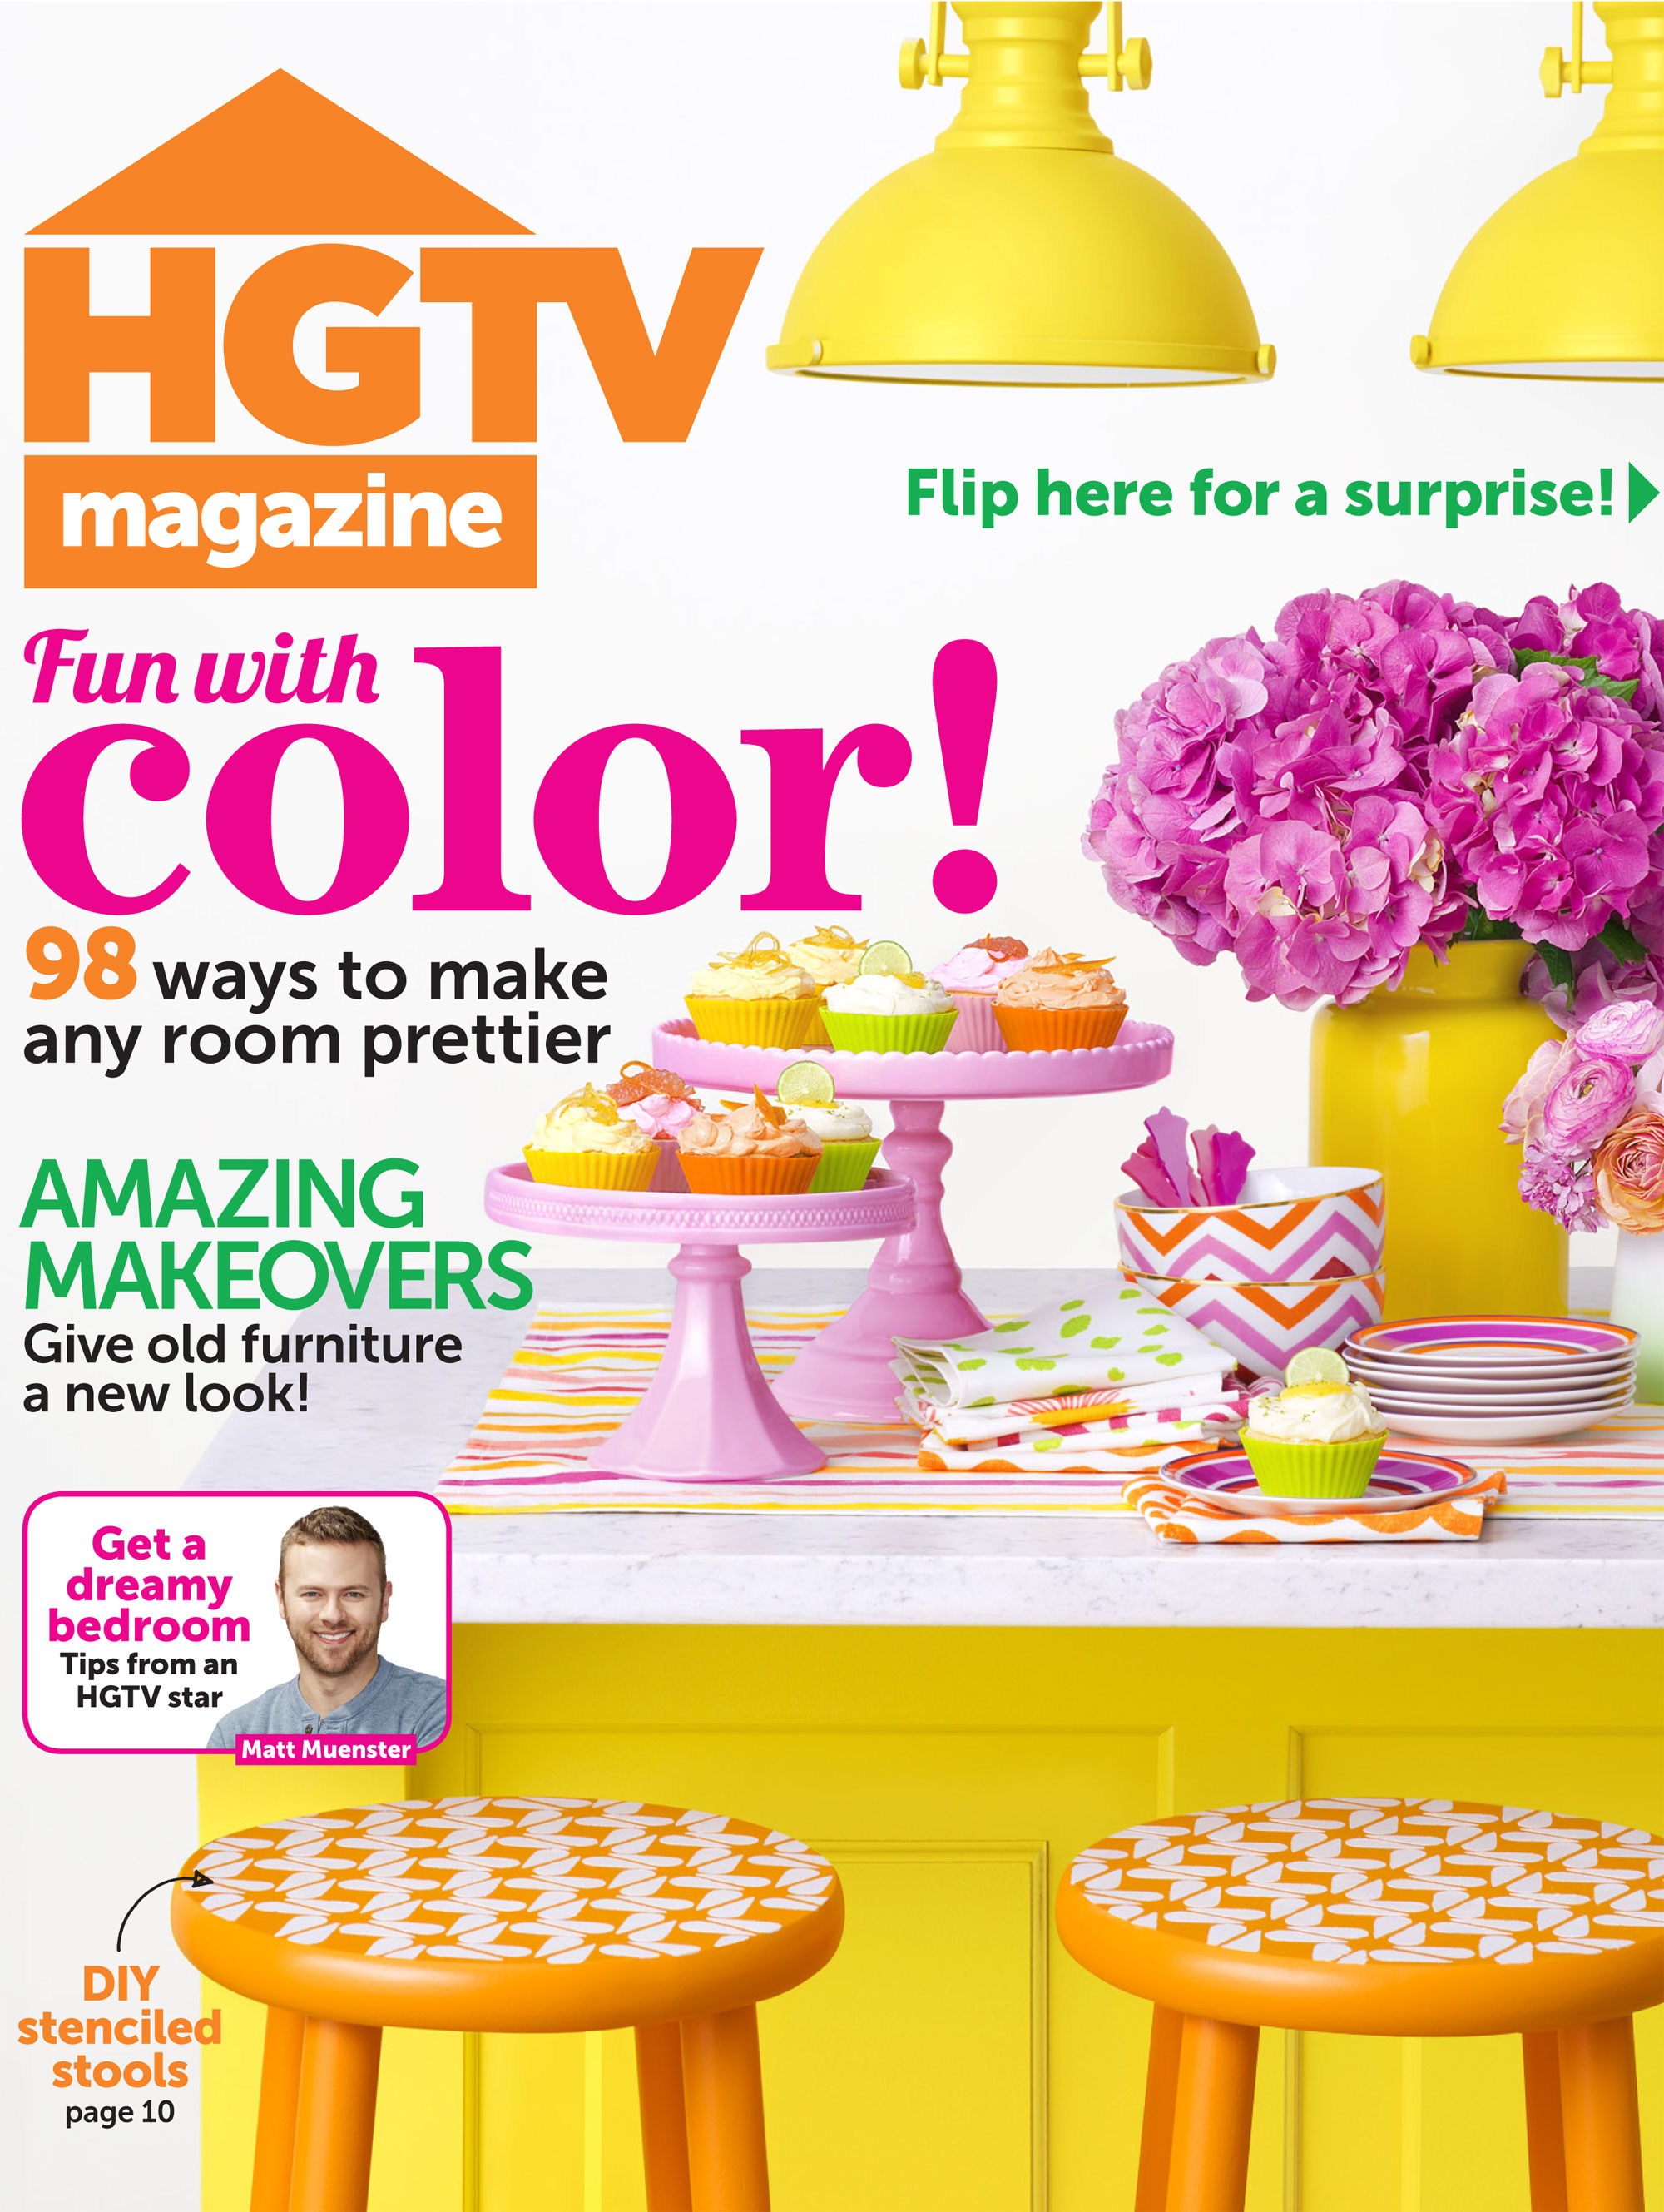 hgtv magazine 2014 furniture. Hgtv Magazine 2014 Furniture A